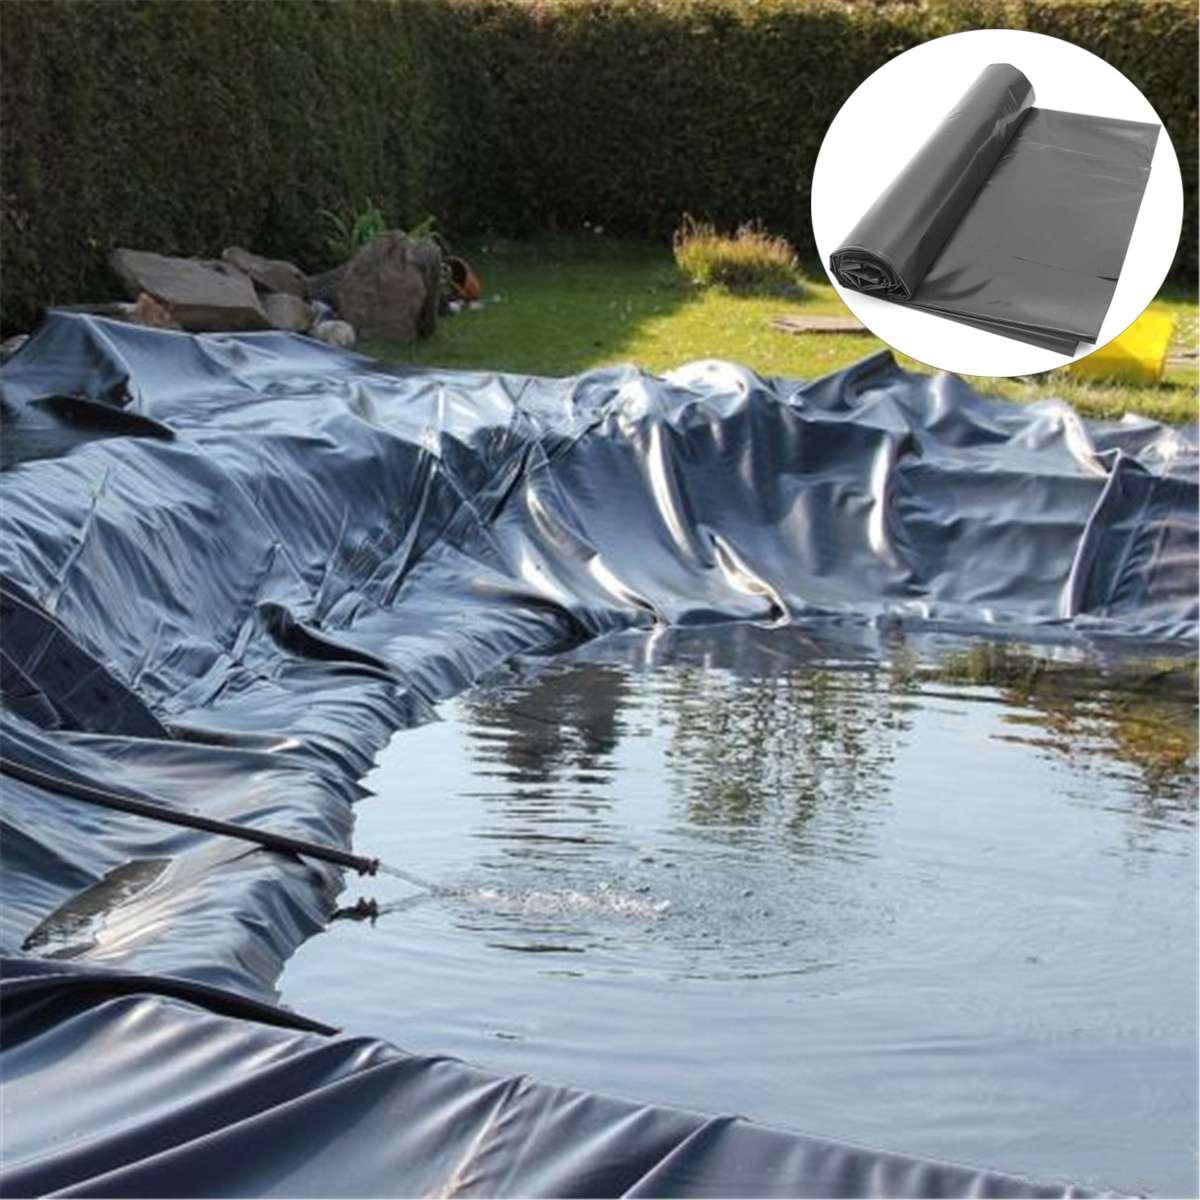 Revestimiento de caucho para estanque de peces HDPE, cubierta de membrana Impermeable gruesa para paisajismo, cubierta para piscinas de 4x 4m/5x 5m/7x7m, revestimientos para estanque